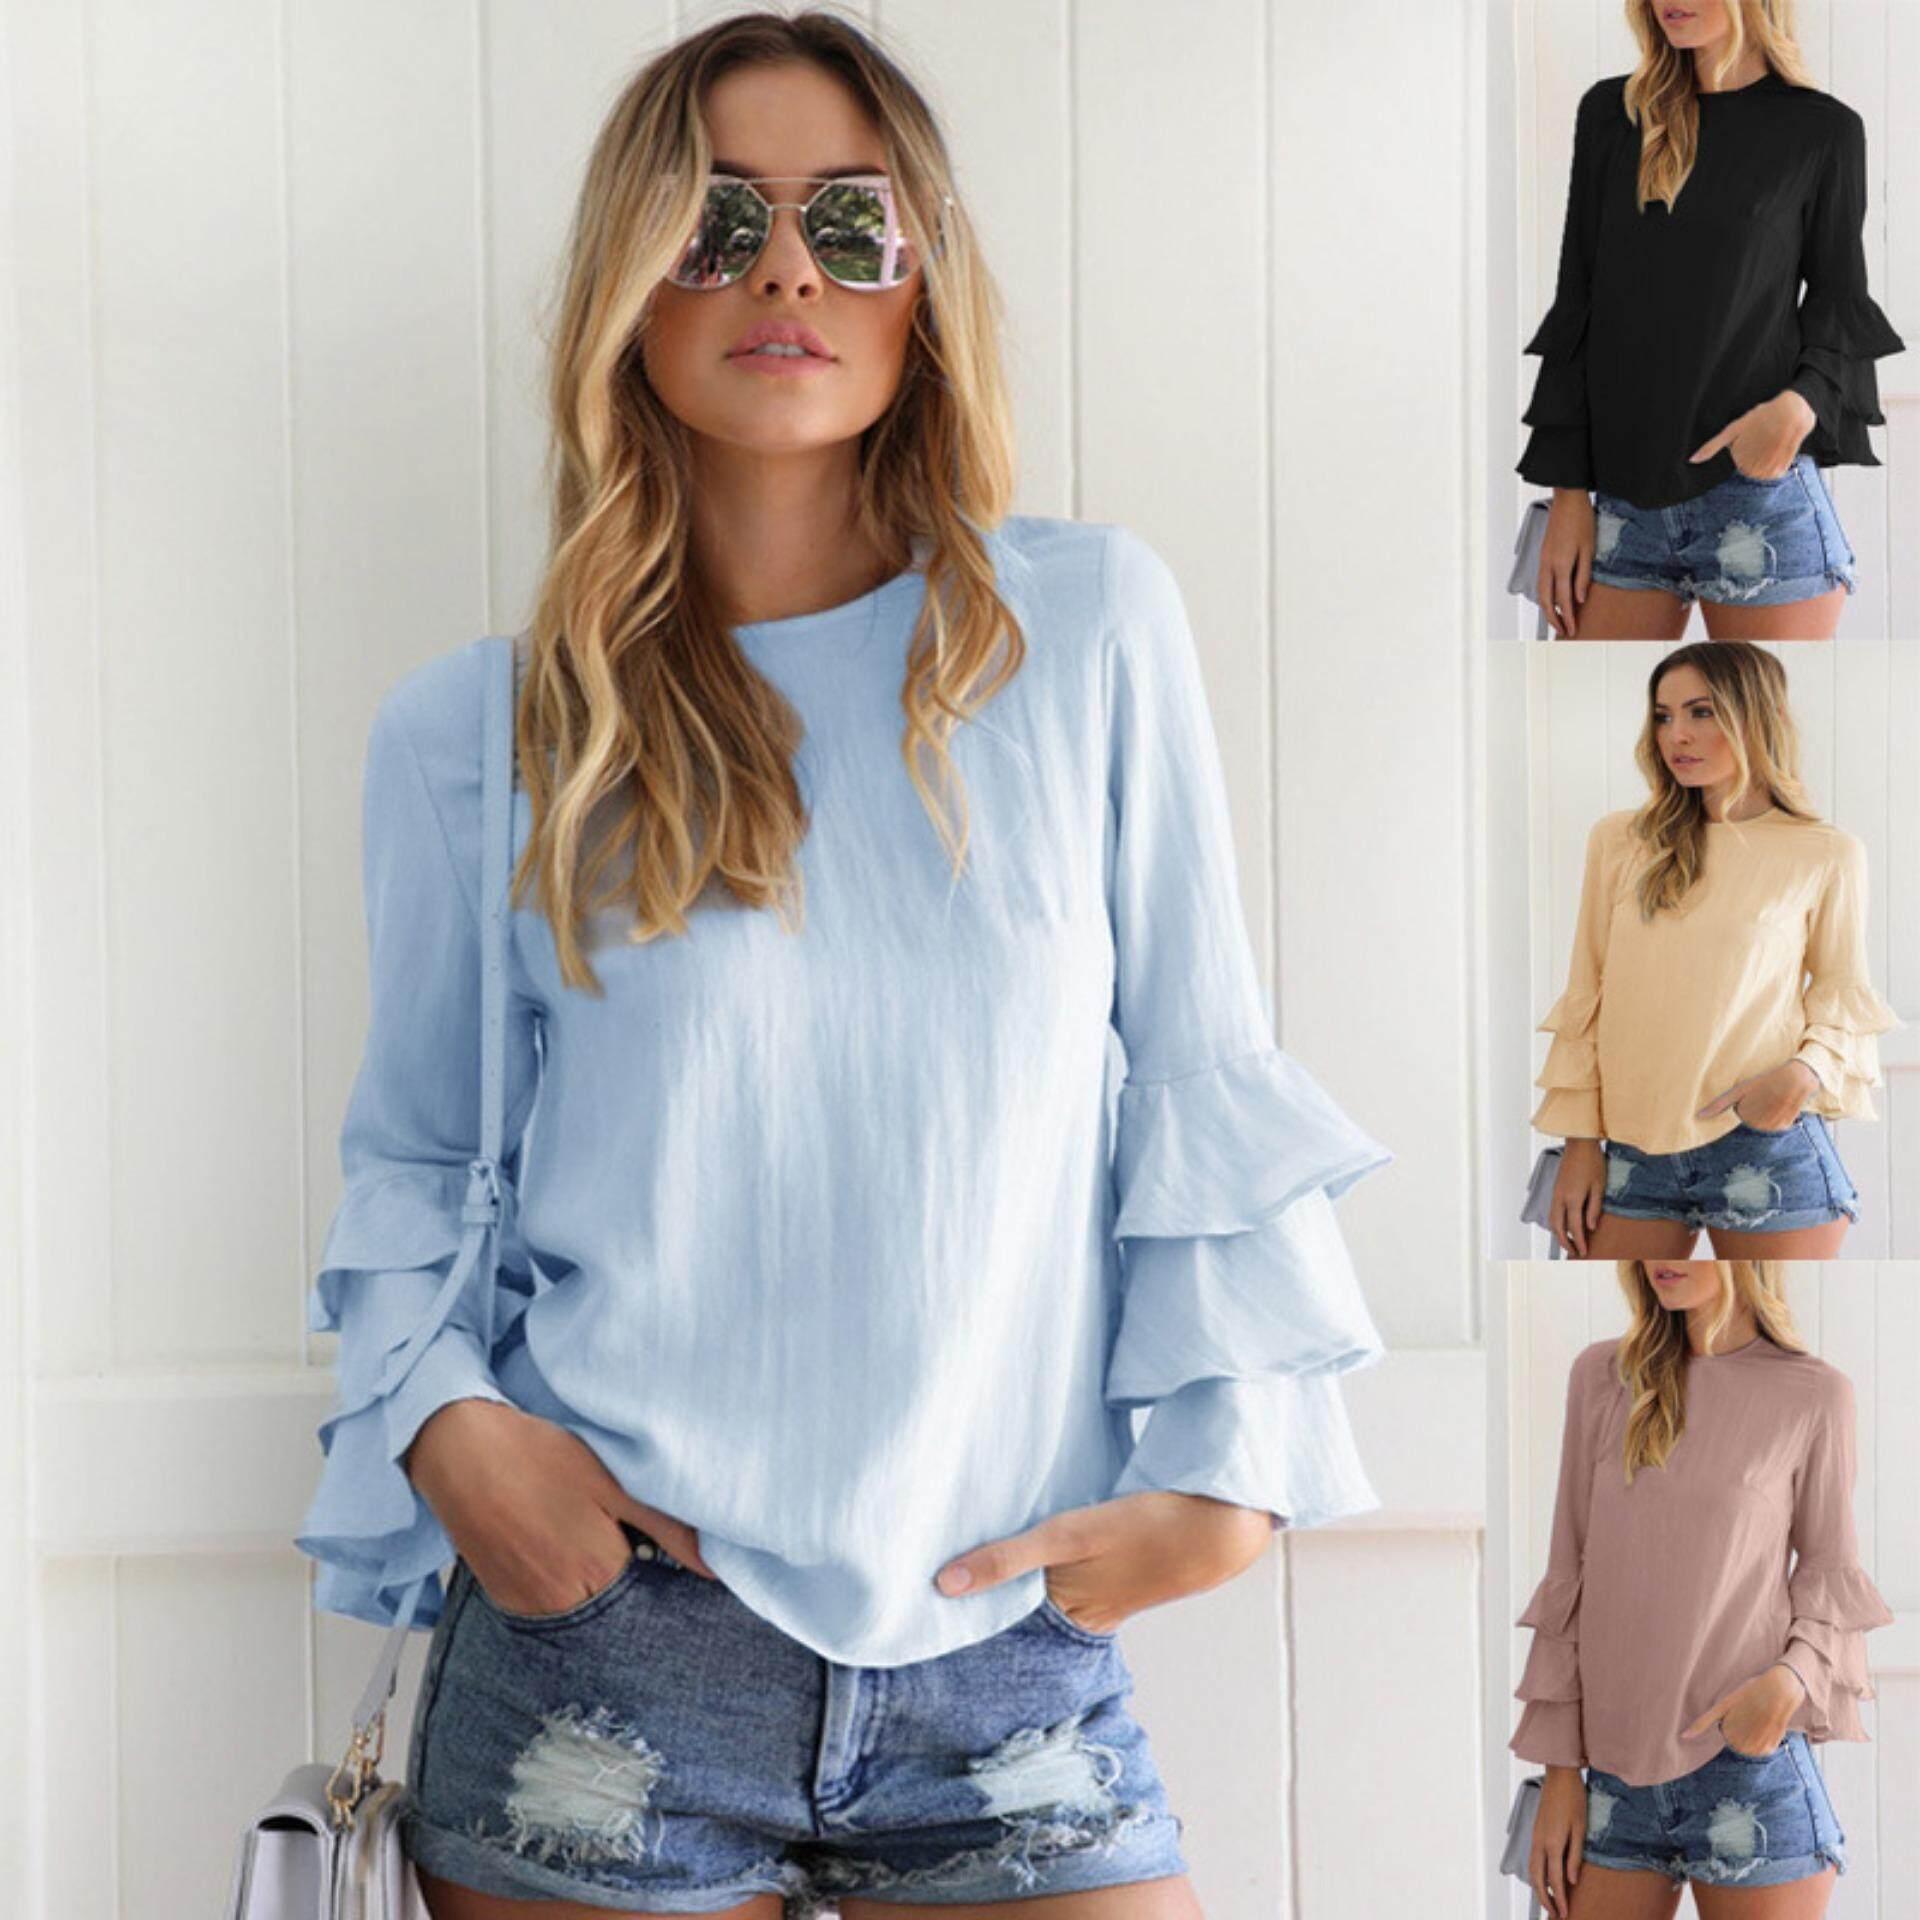 Bolster Store Women's Elegant Flared Bell Ruffled Flounce Long Sleeve Blouses Casual Shirts Round Neck Tee ( Light Blue )